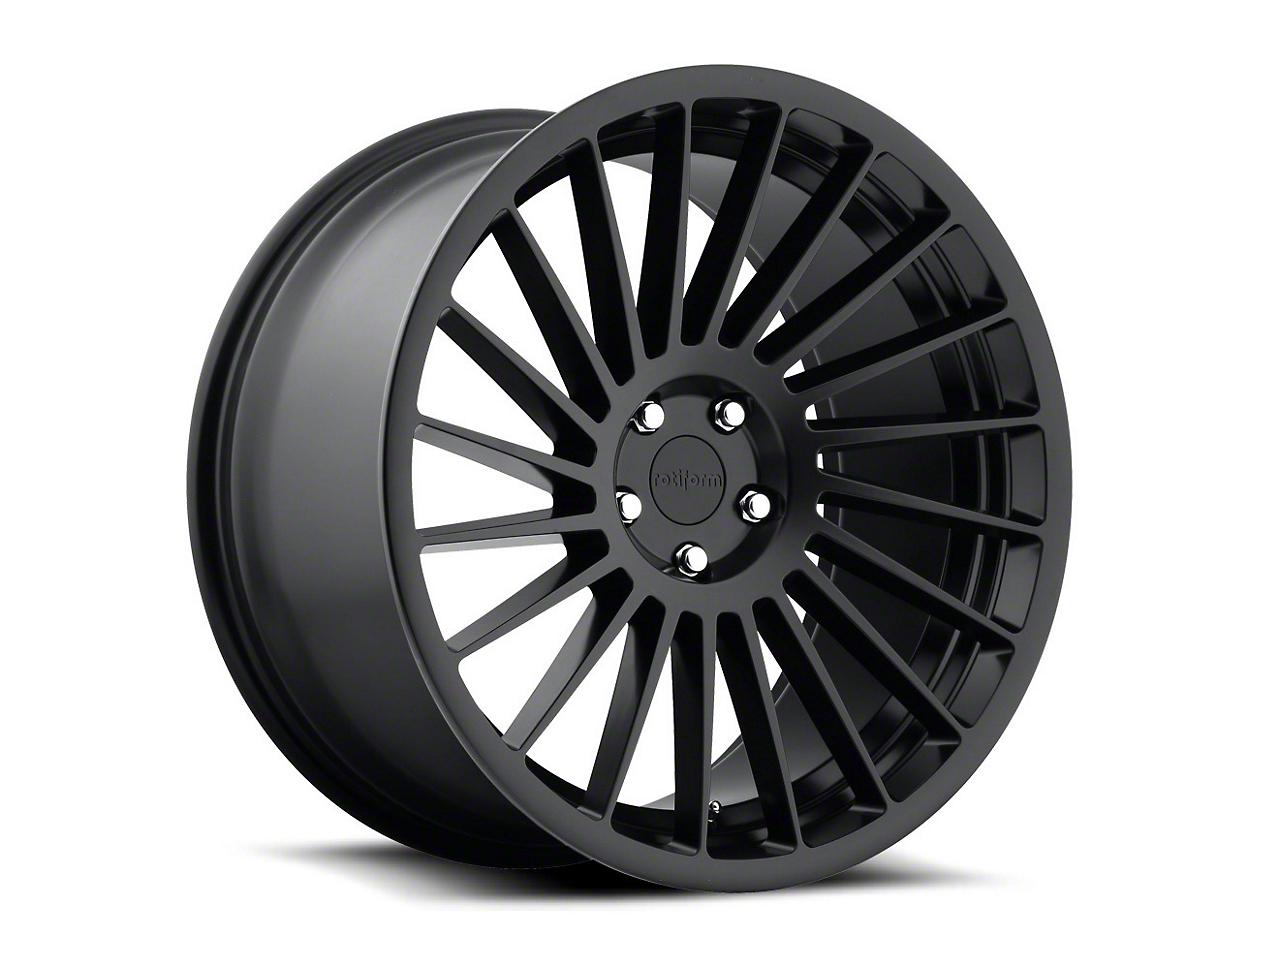 Rotiform Matte Black IND-T Wheel - Driver Side - 19x8.5 (15-17 All)